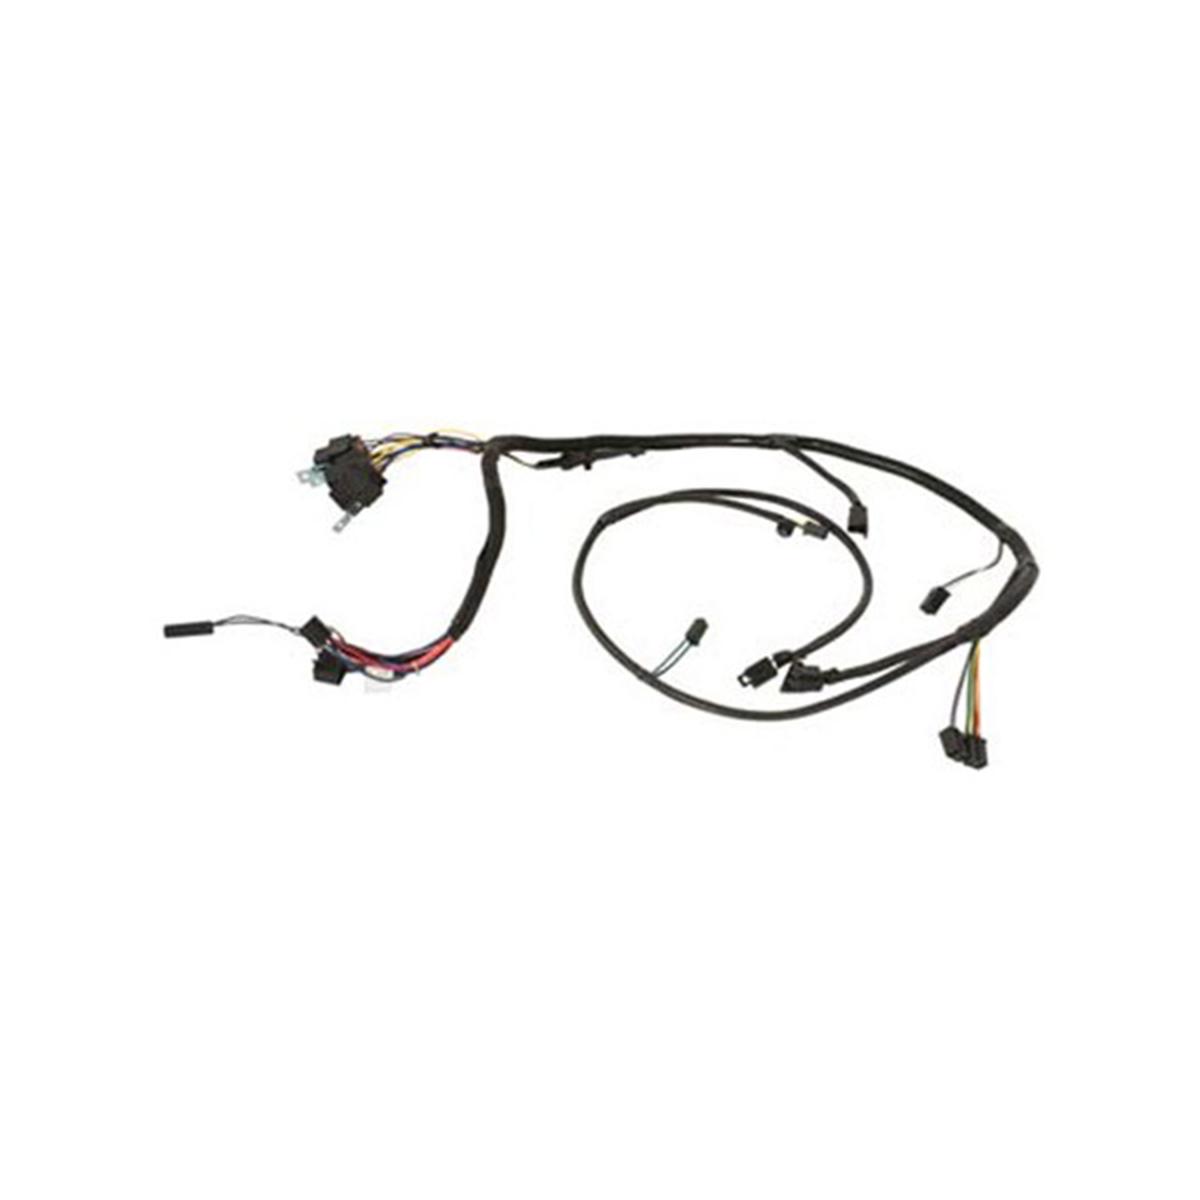 dixie chopper wiring harness 500086